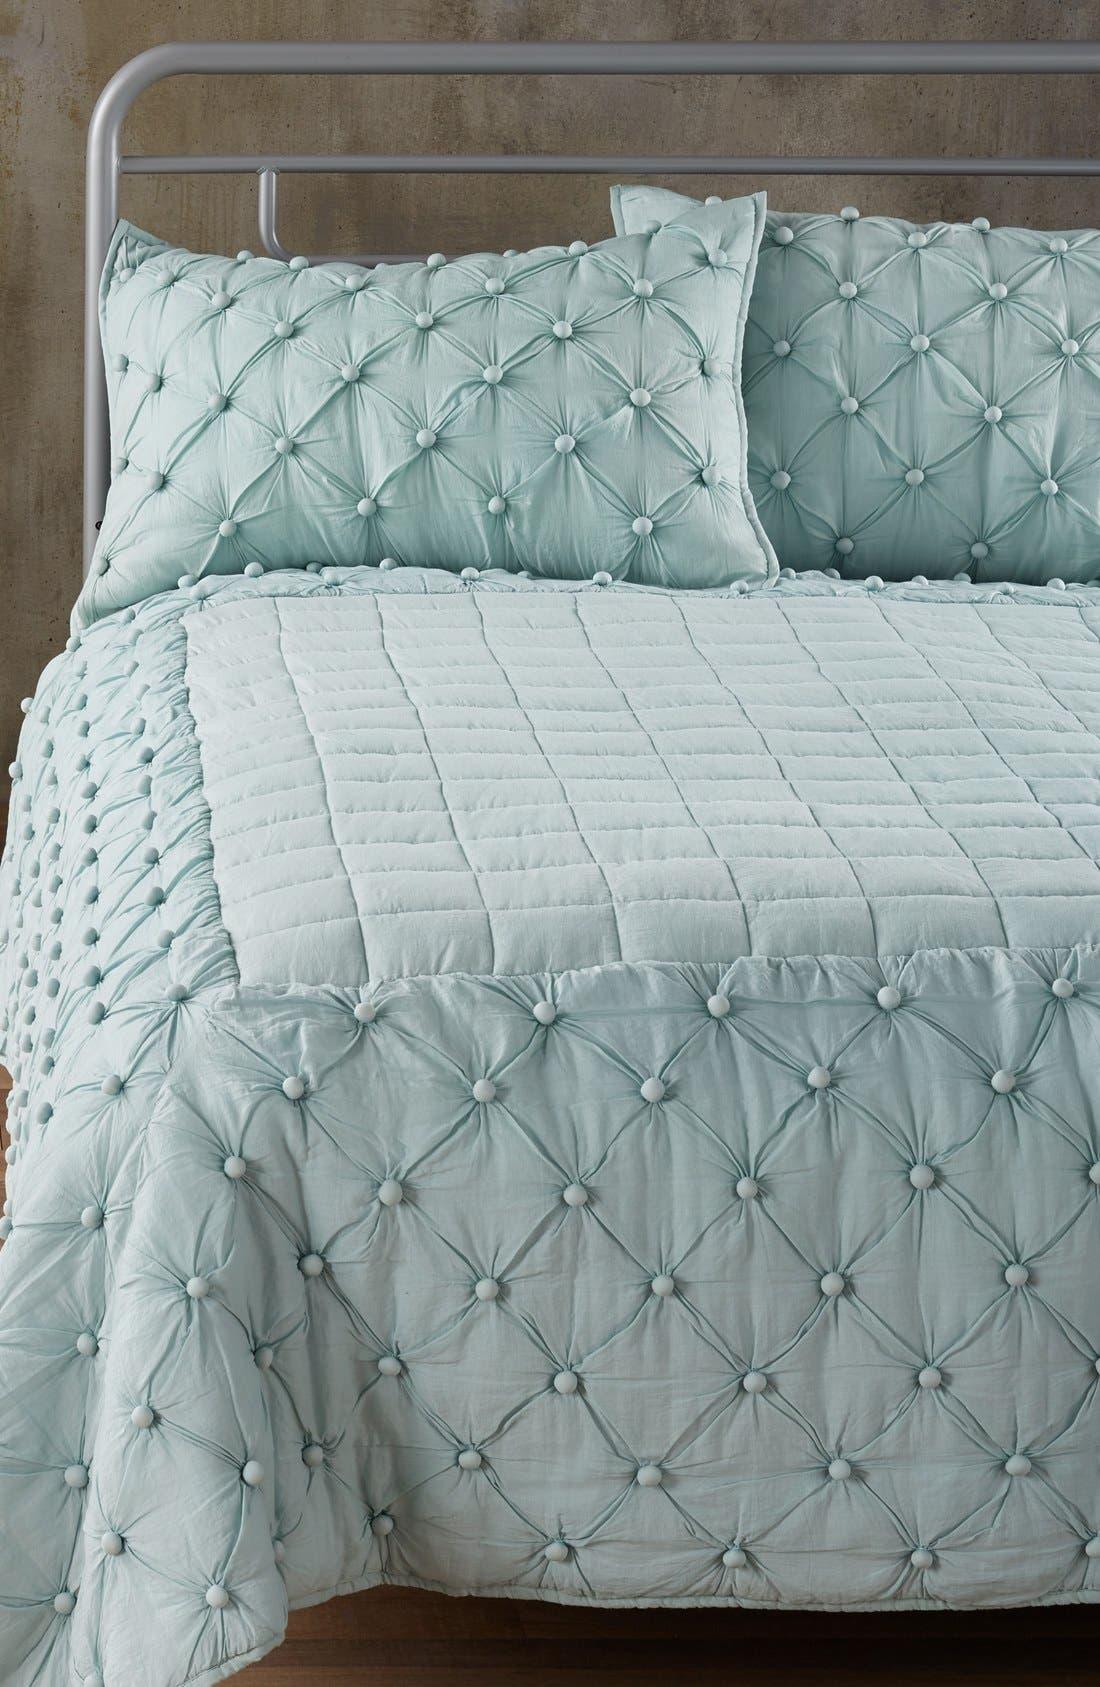 Alternate Image 1 Selected - Nordstrom at Home 'Chelsea' Comforter